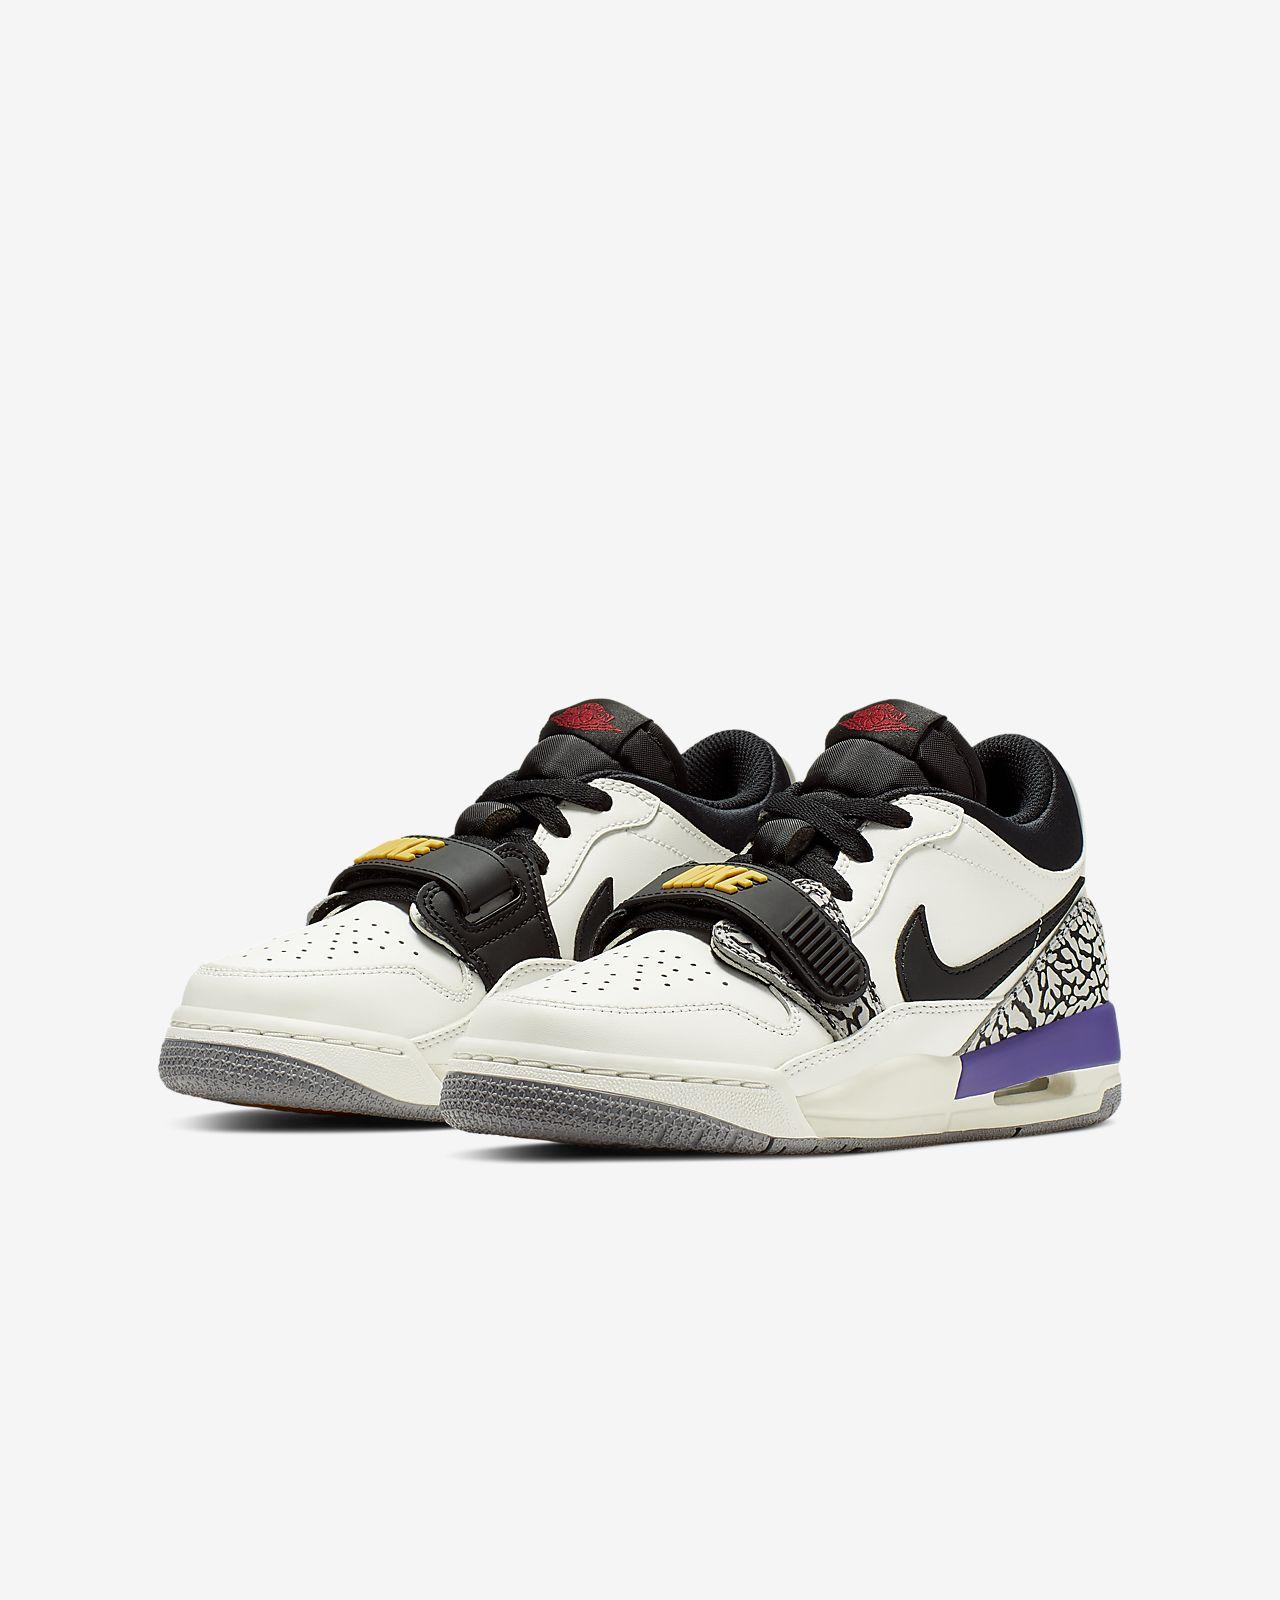 Air Jordan Legacy 312 Low Schuh für ältere Kinder